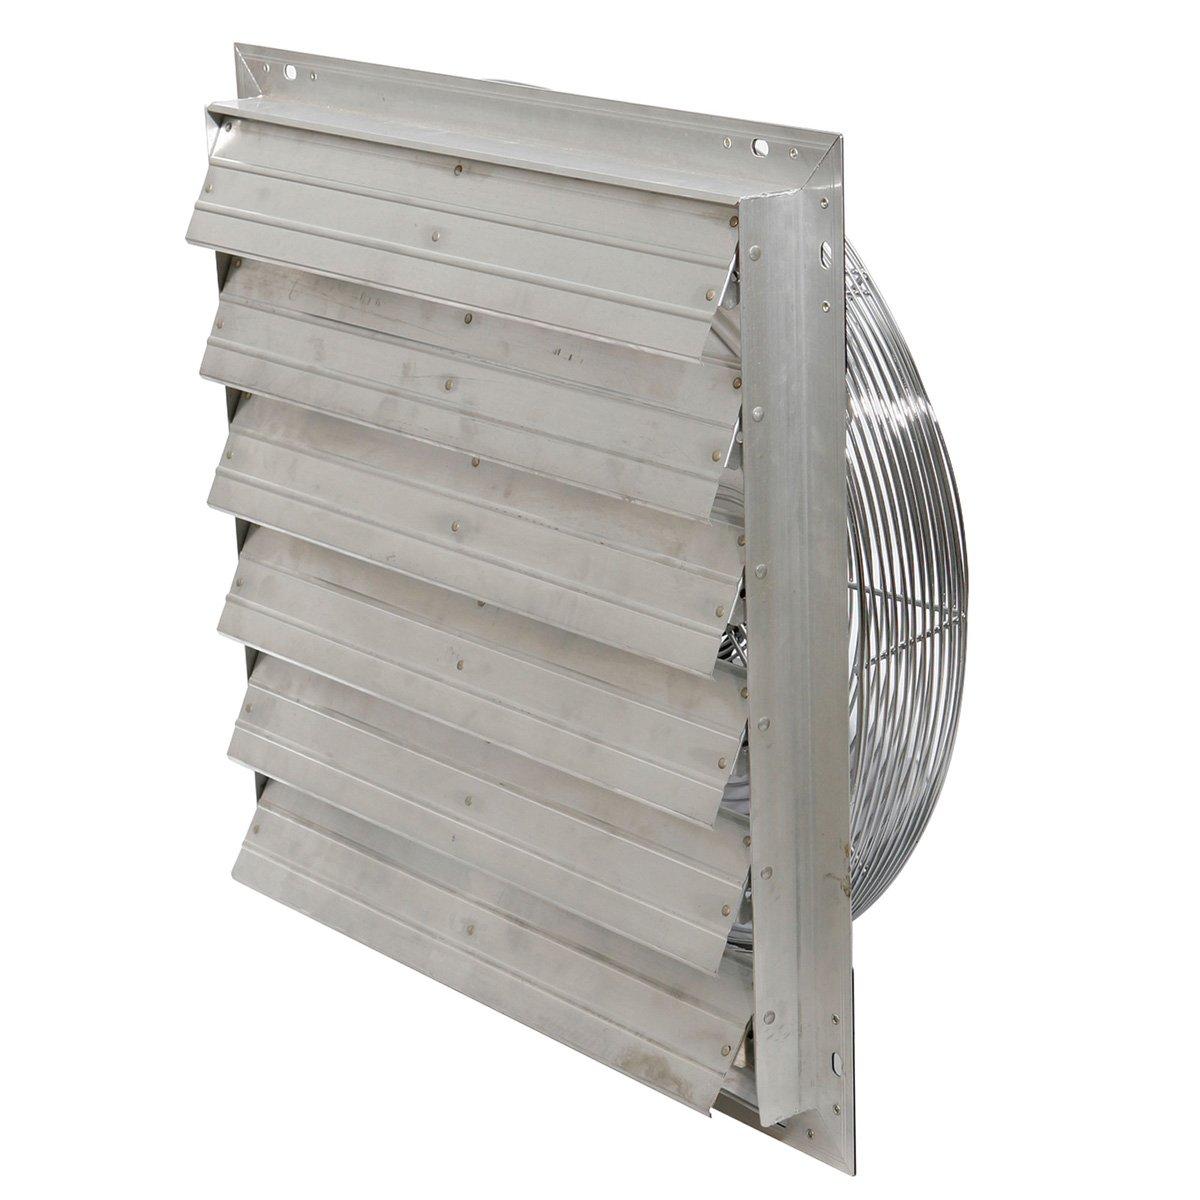 astounding i ventilation bathroom venting air fan for and frugal door fresh vent through soffit garage